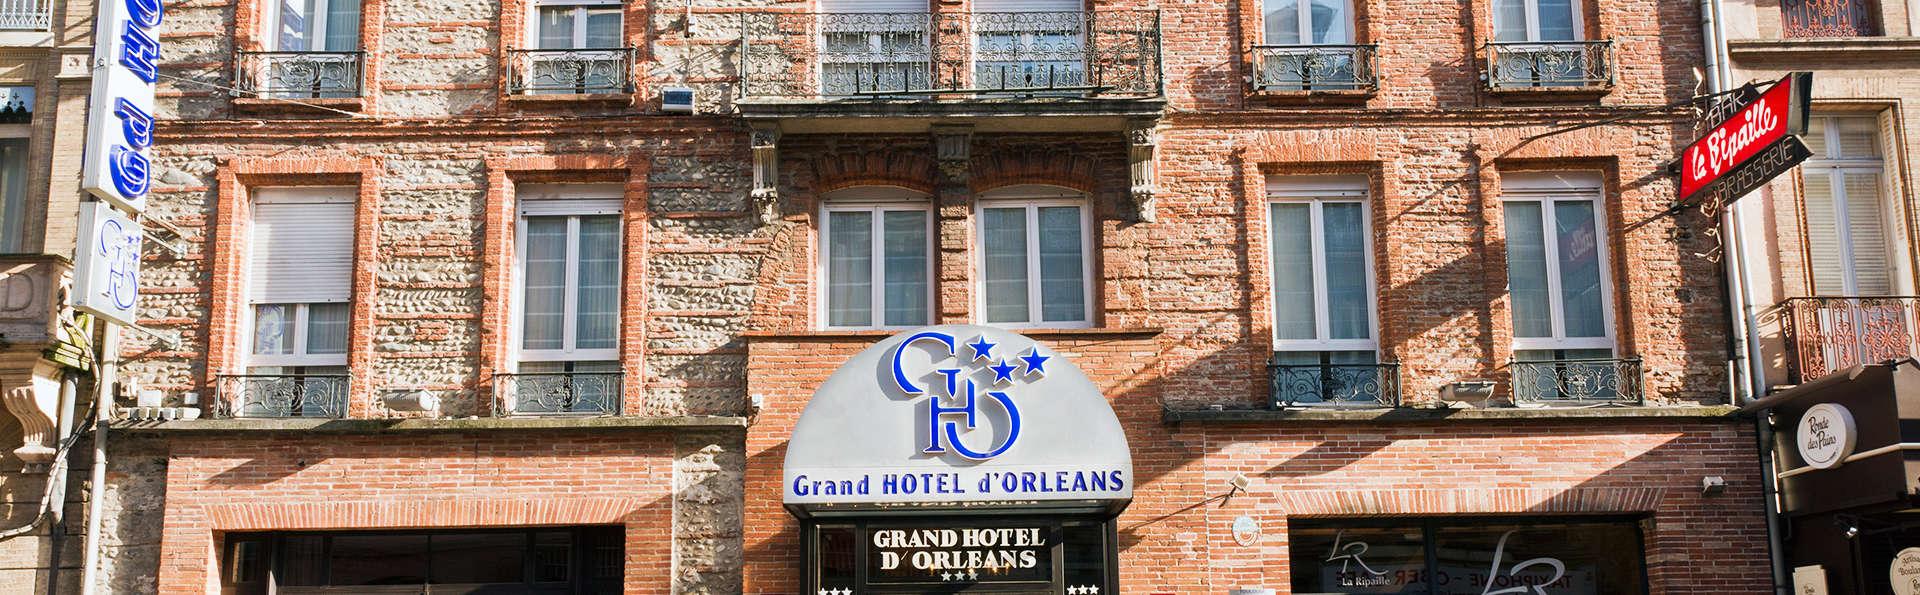 Week-end de charme en plein coeur de Toulouse